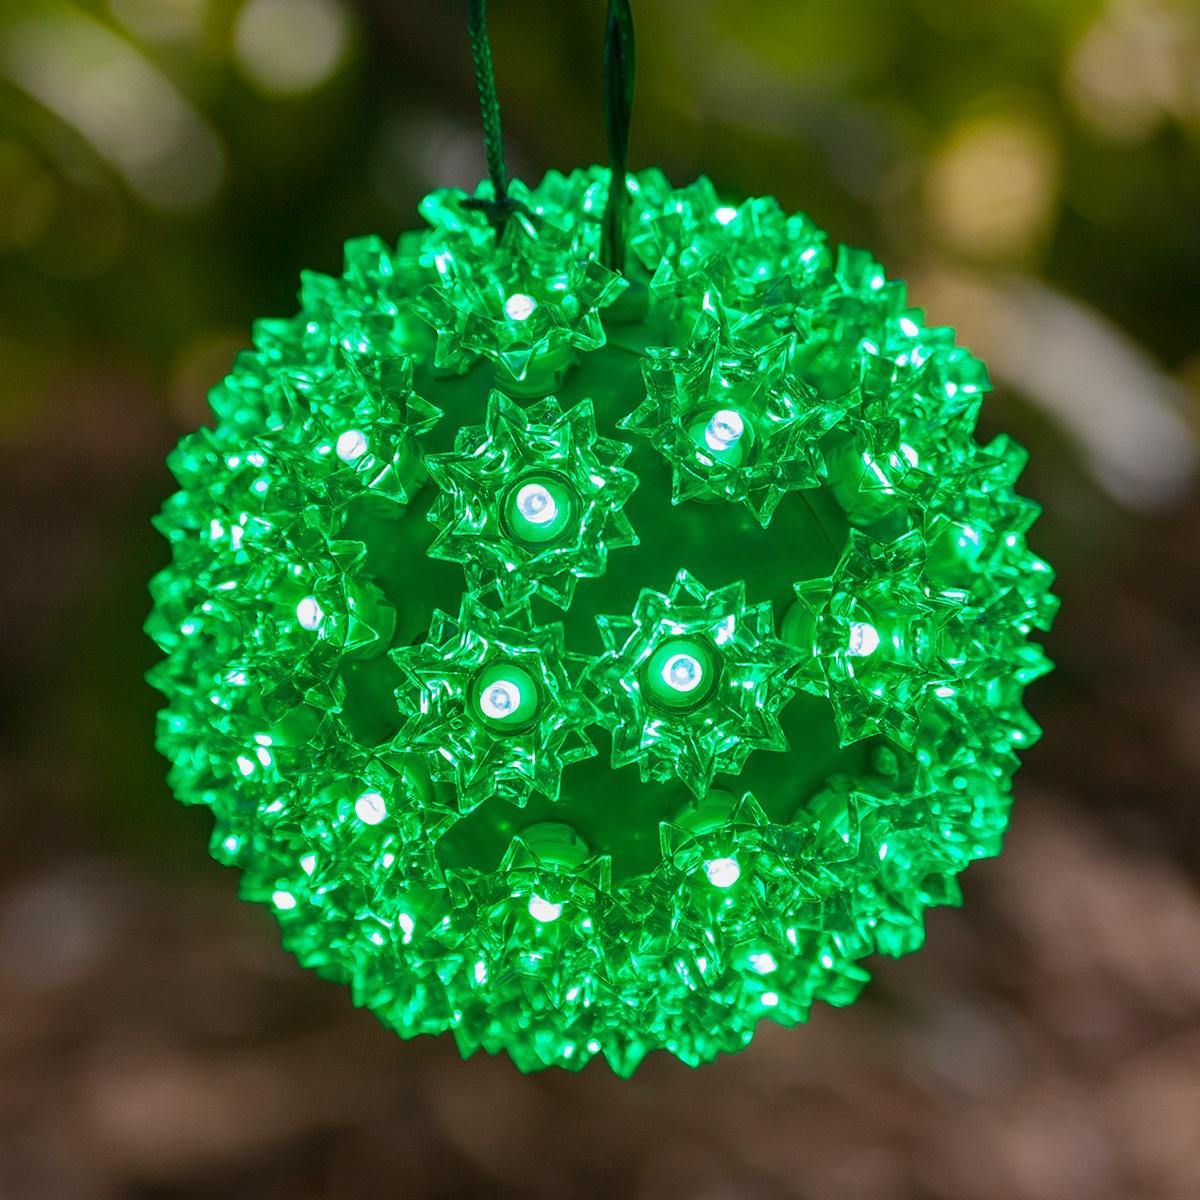 Light sphere green led yard envy solutioingenieria Choice Image